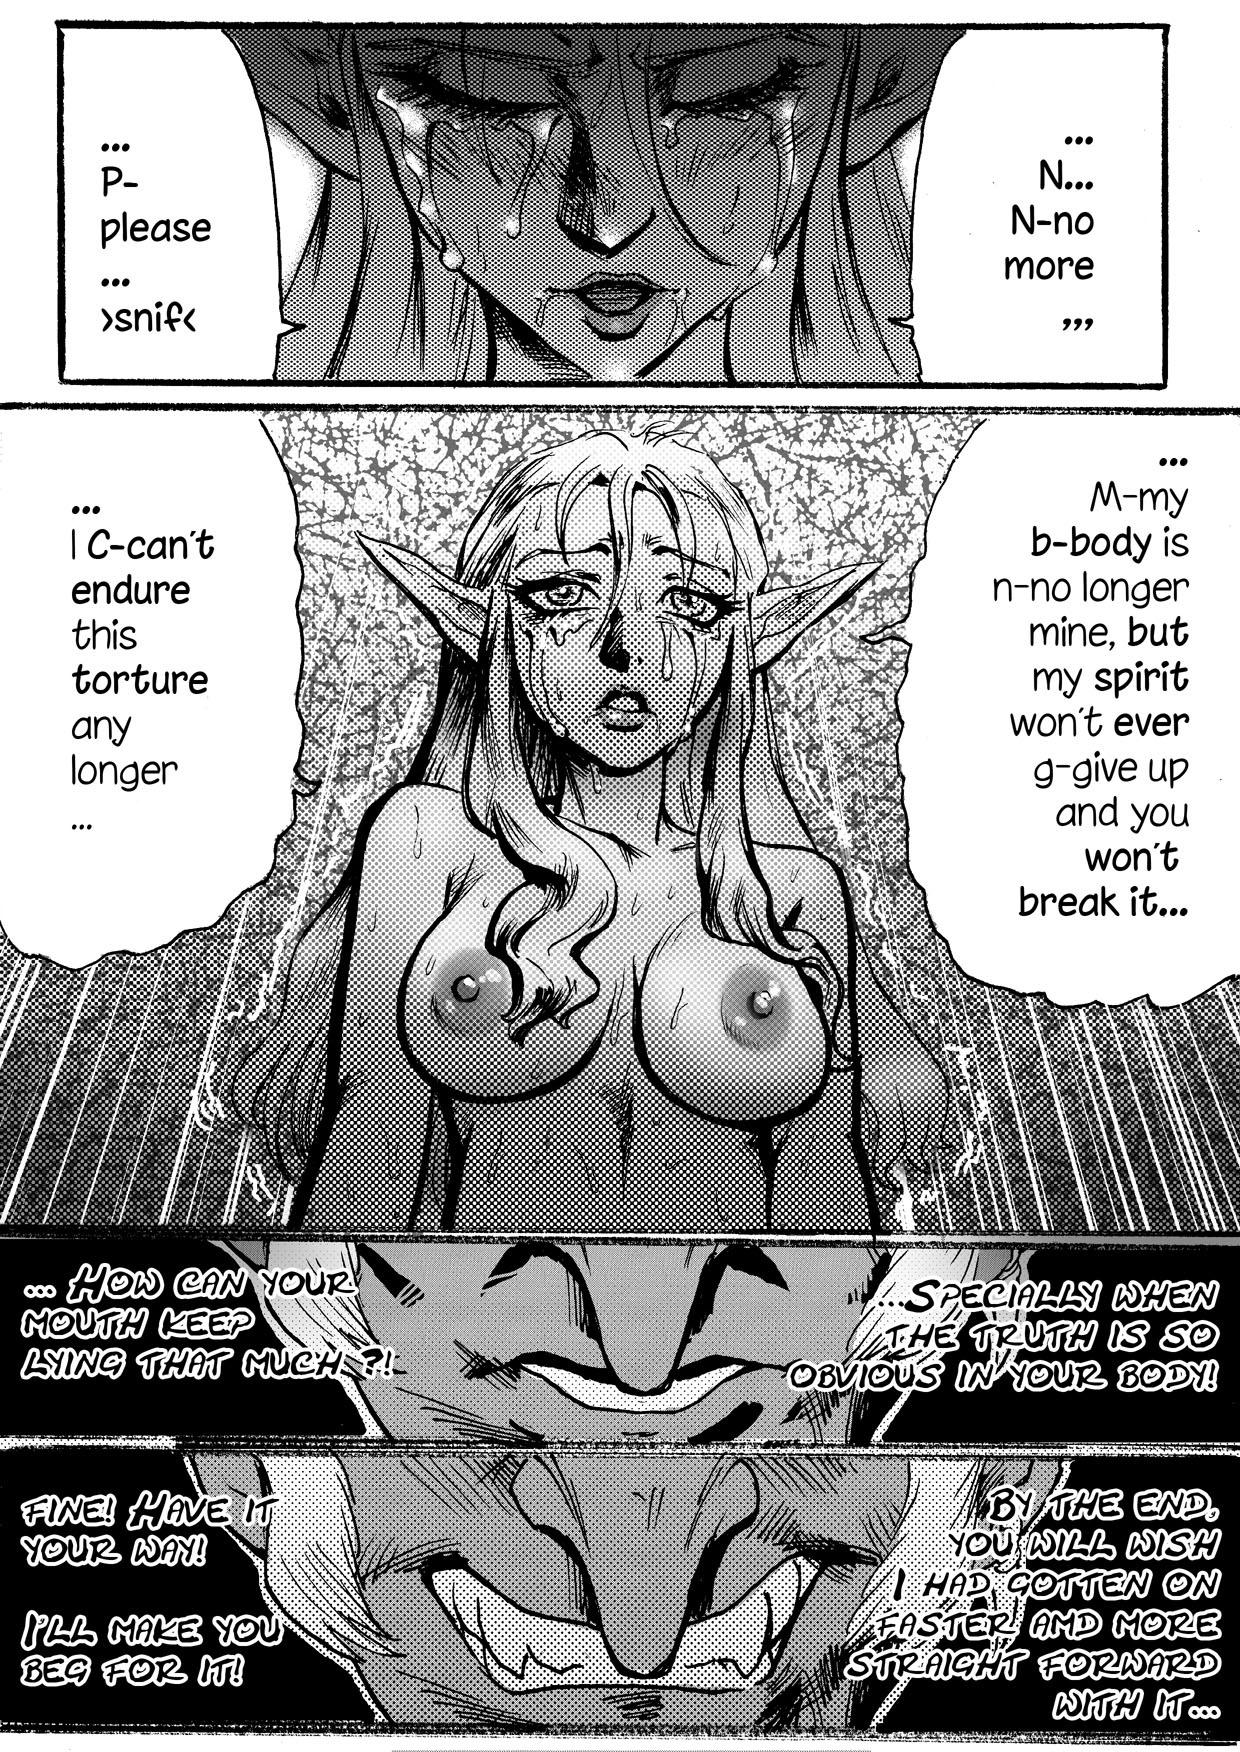 Super Wild Legend porn comics Oral sex, Rape